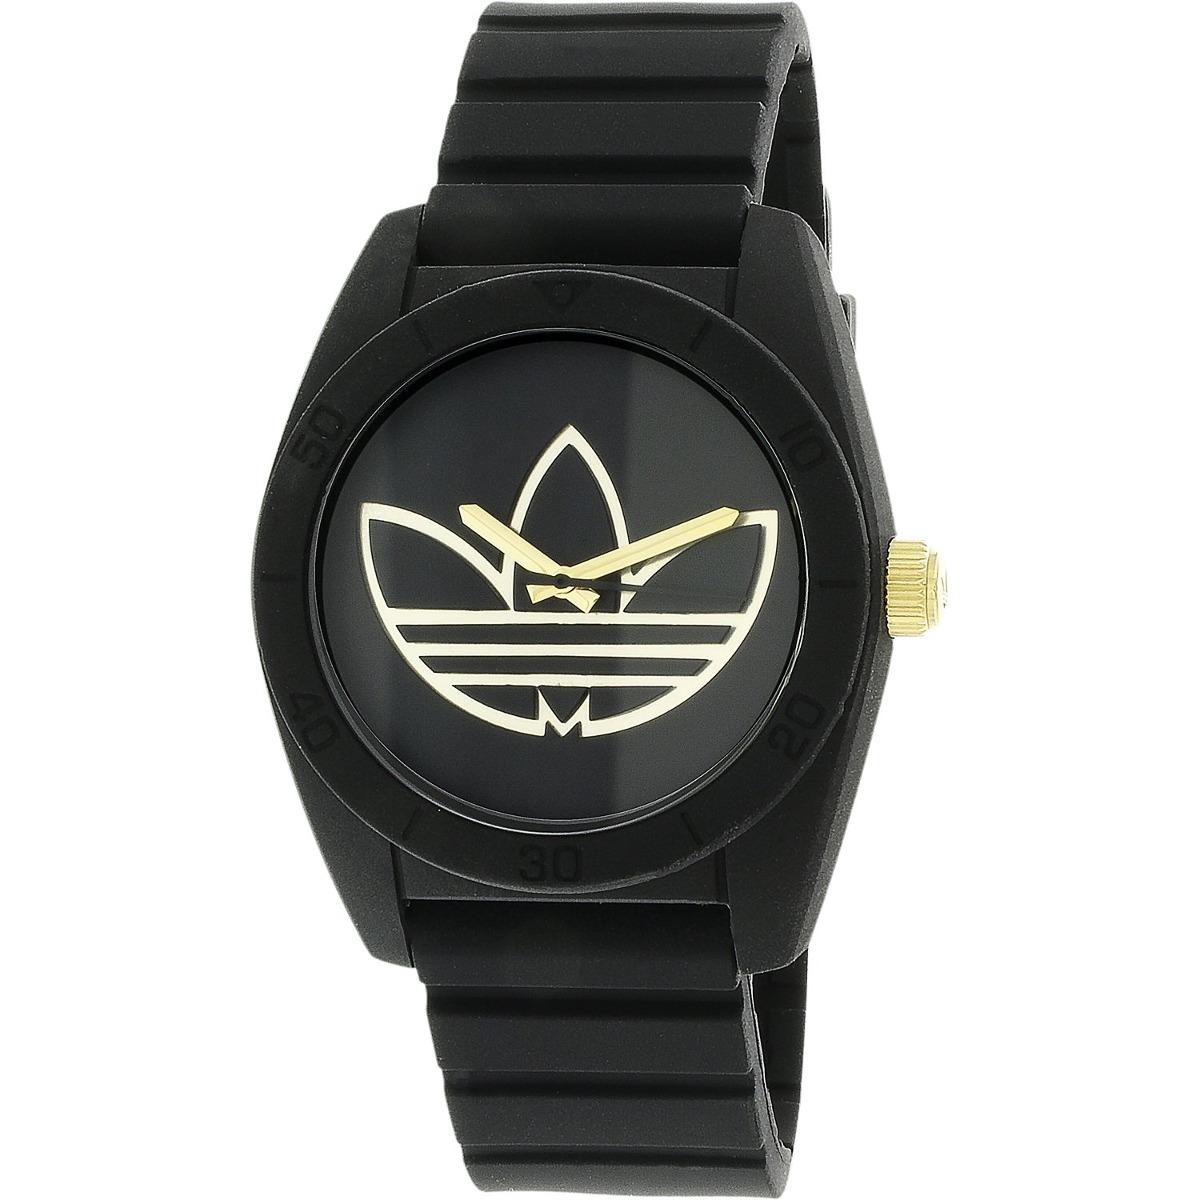 detailed look ff1a9 71b29 reloj adidas para mujer adh3197 santiago deportivo negro. Cargando zoom.